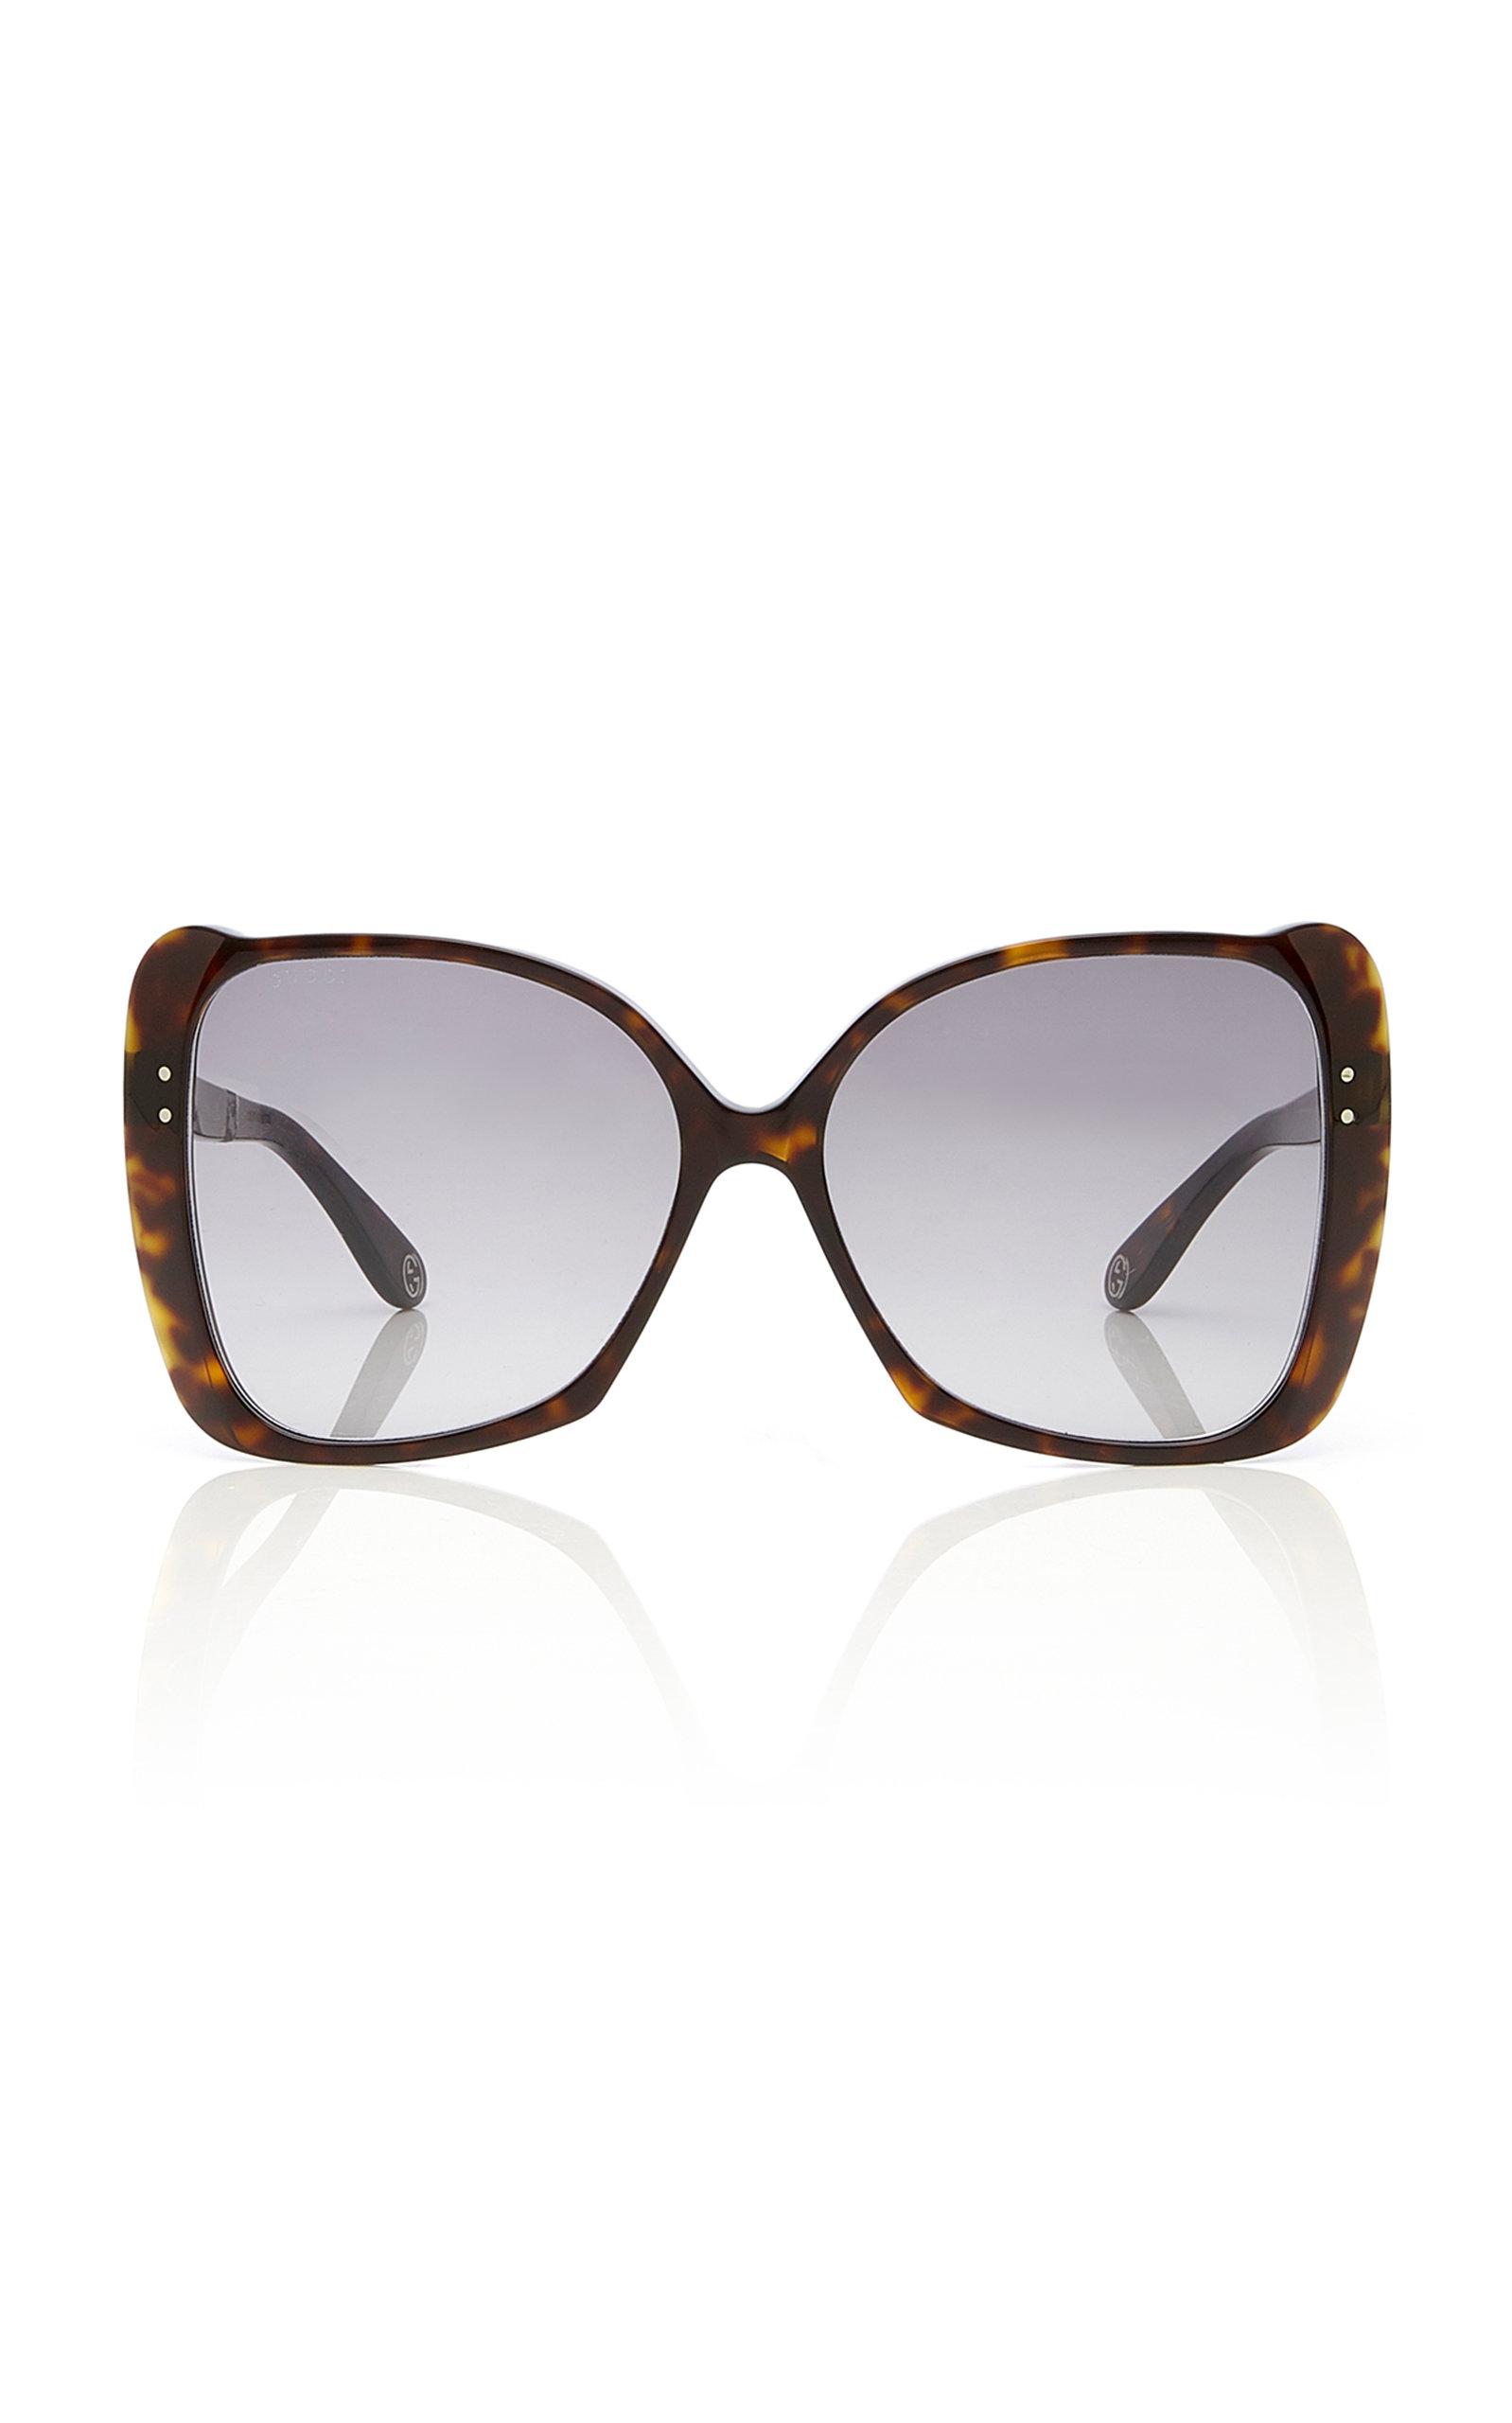 GUCCI | Gucci Sunglasses Butterfly-Frame Tortoiseshell Acetate Sunglasses | Goxip